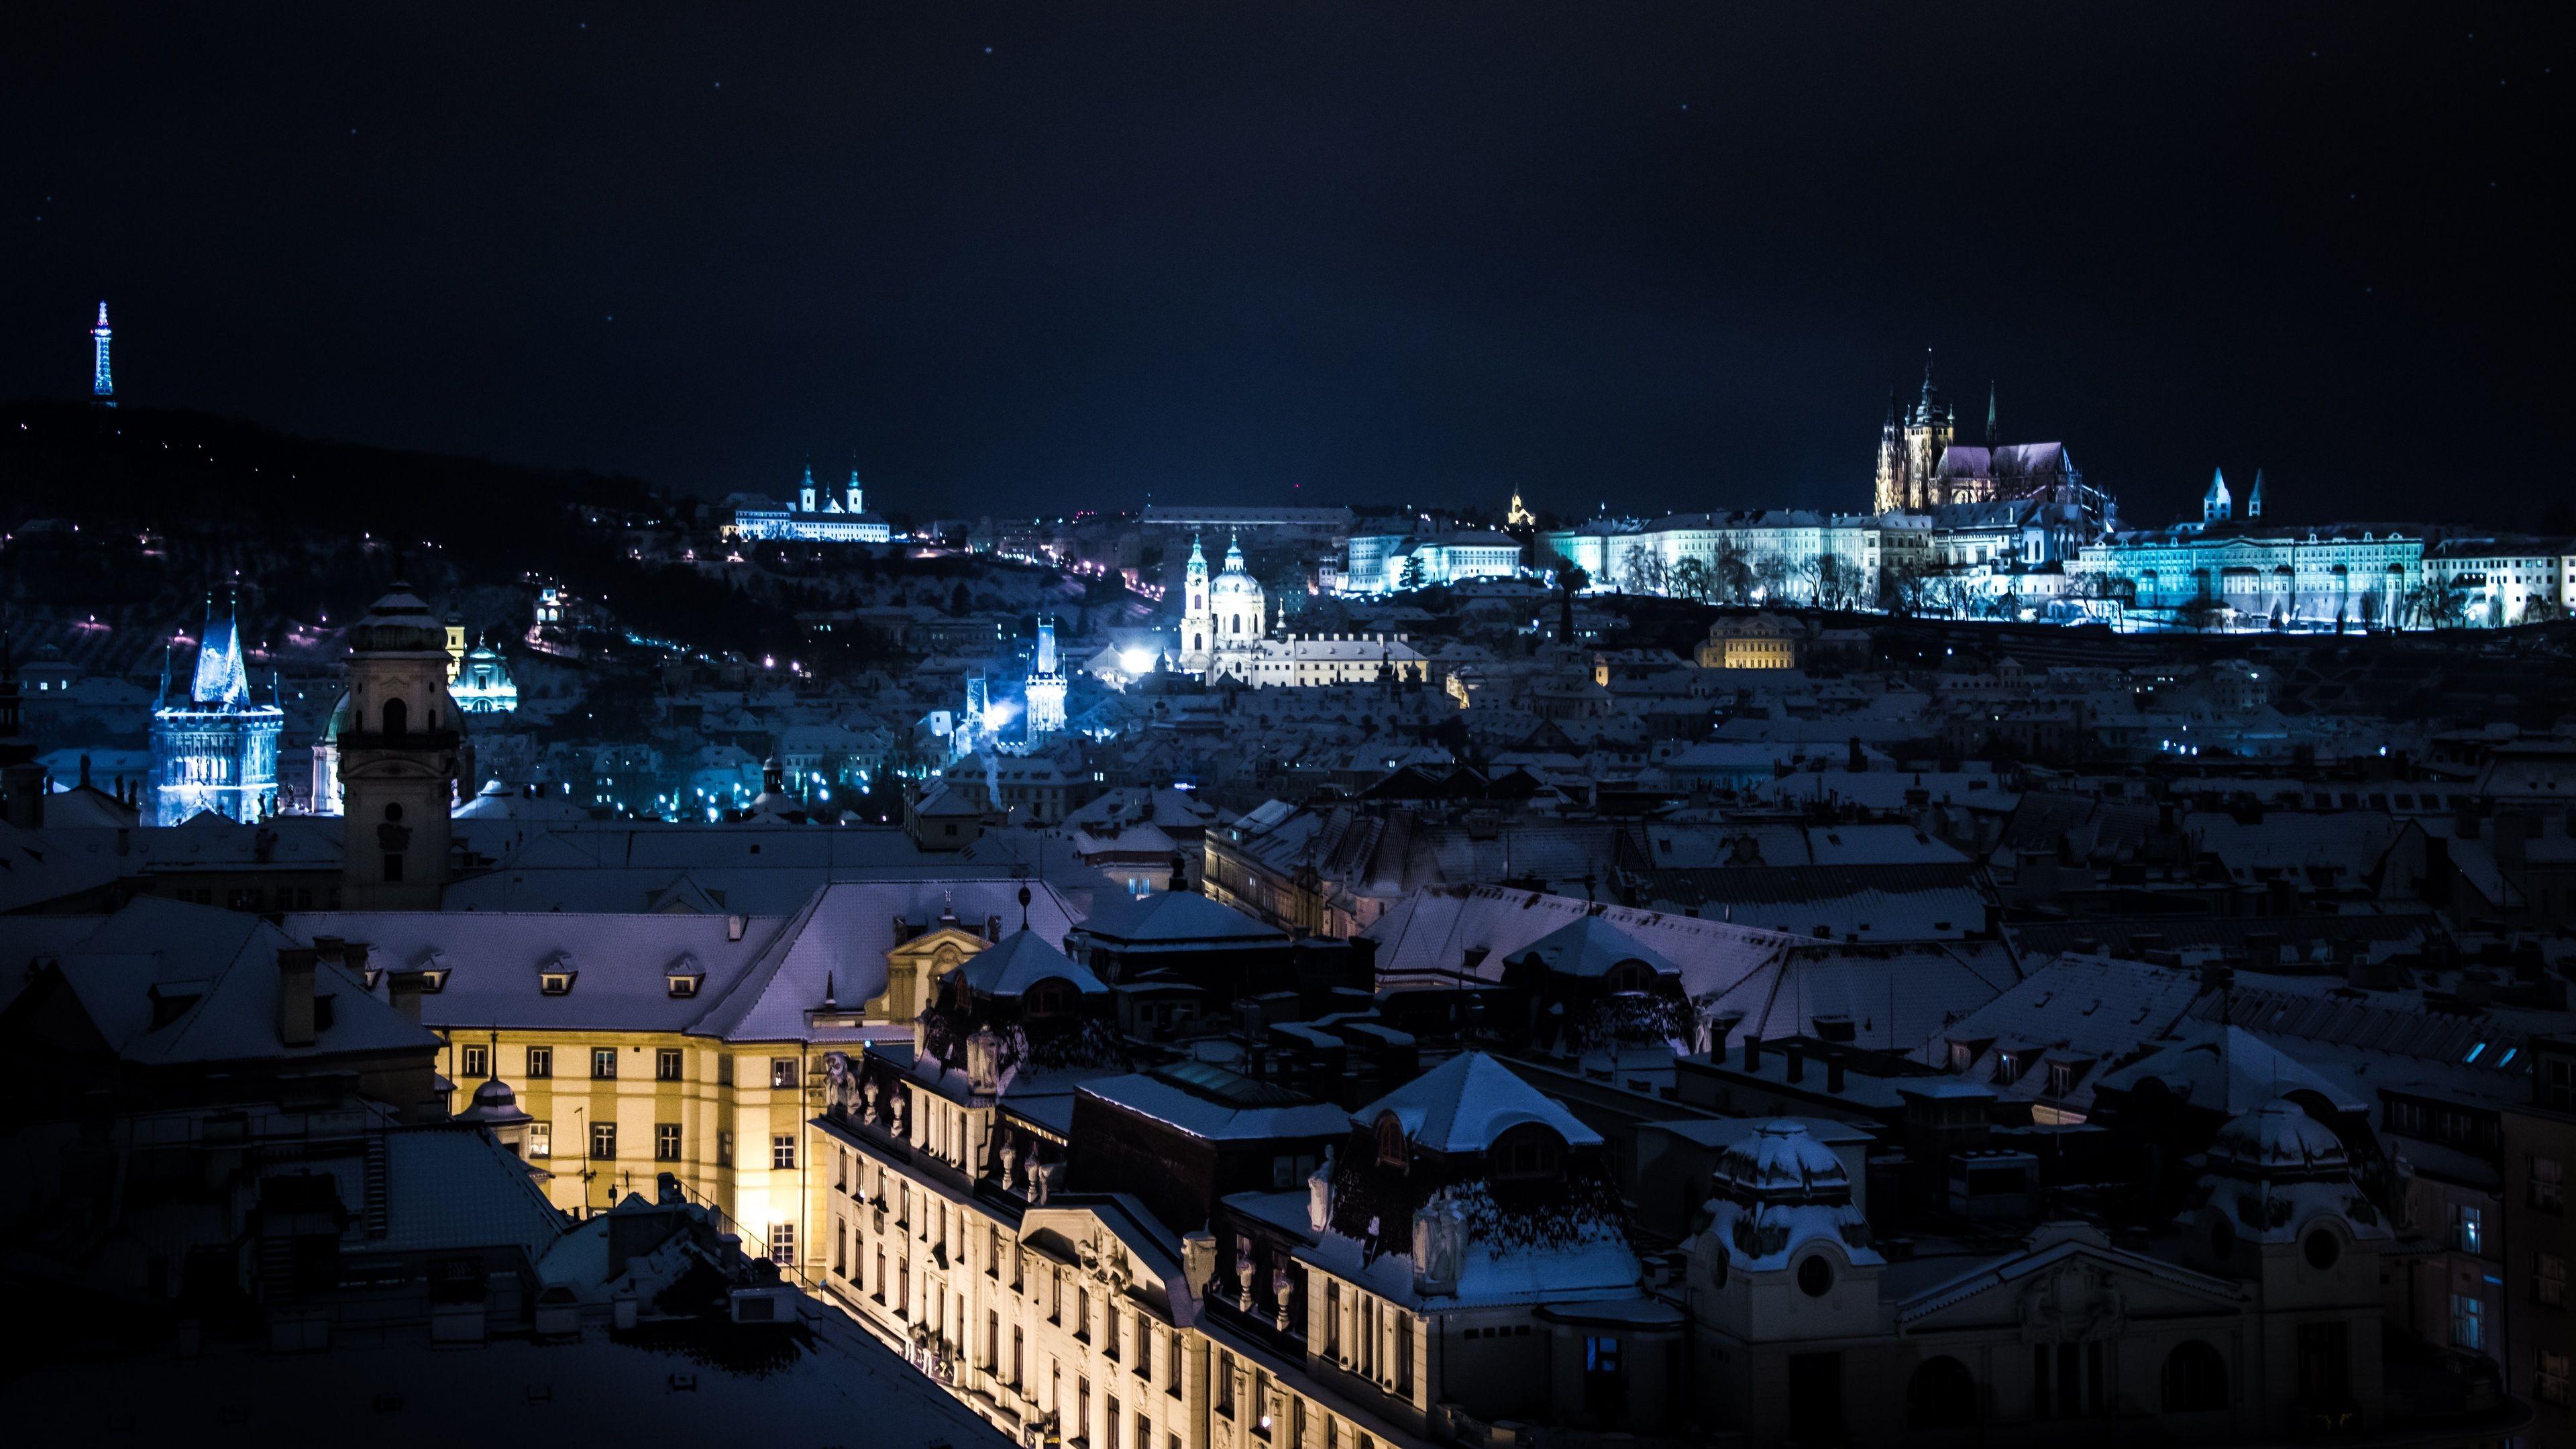 Illuminated City by Night Tour